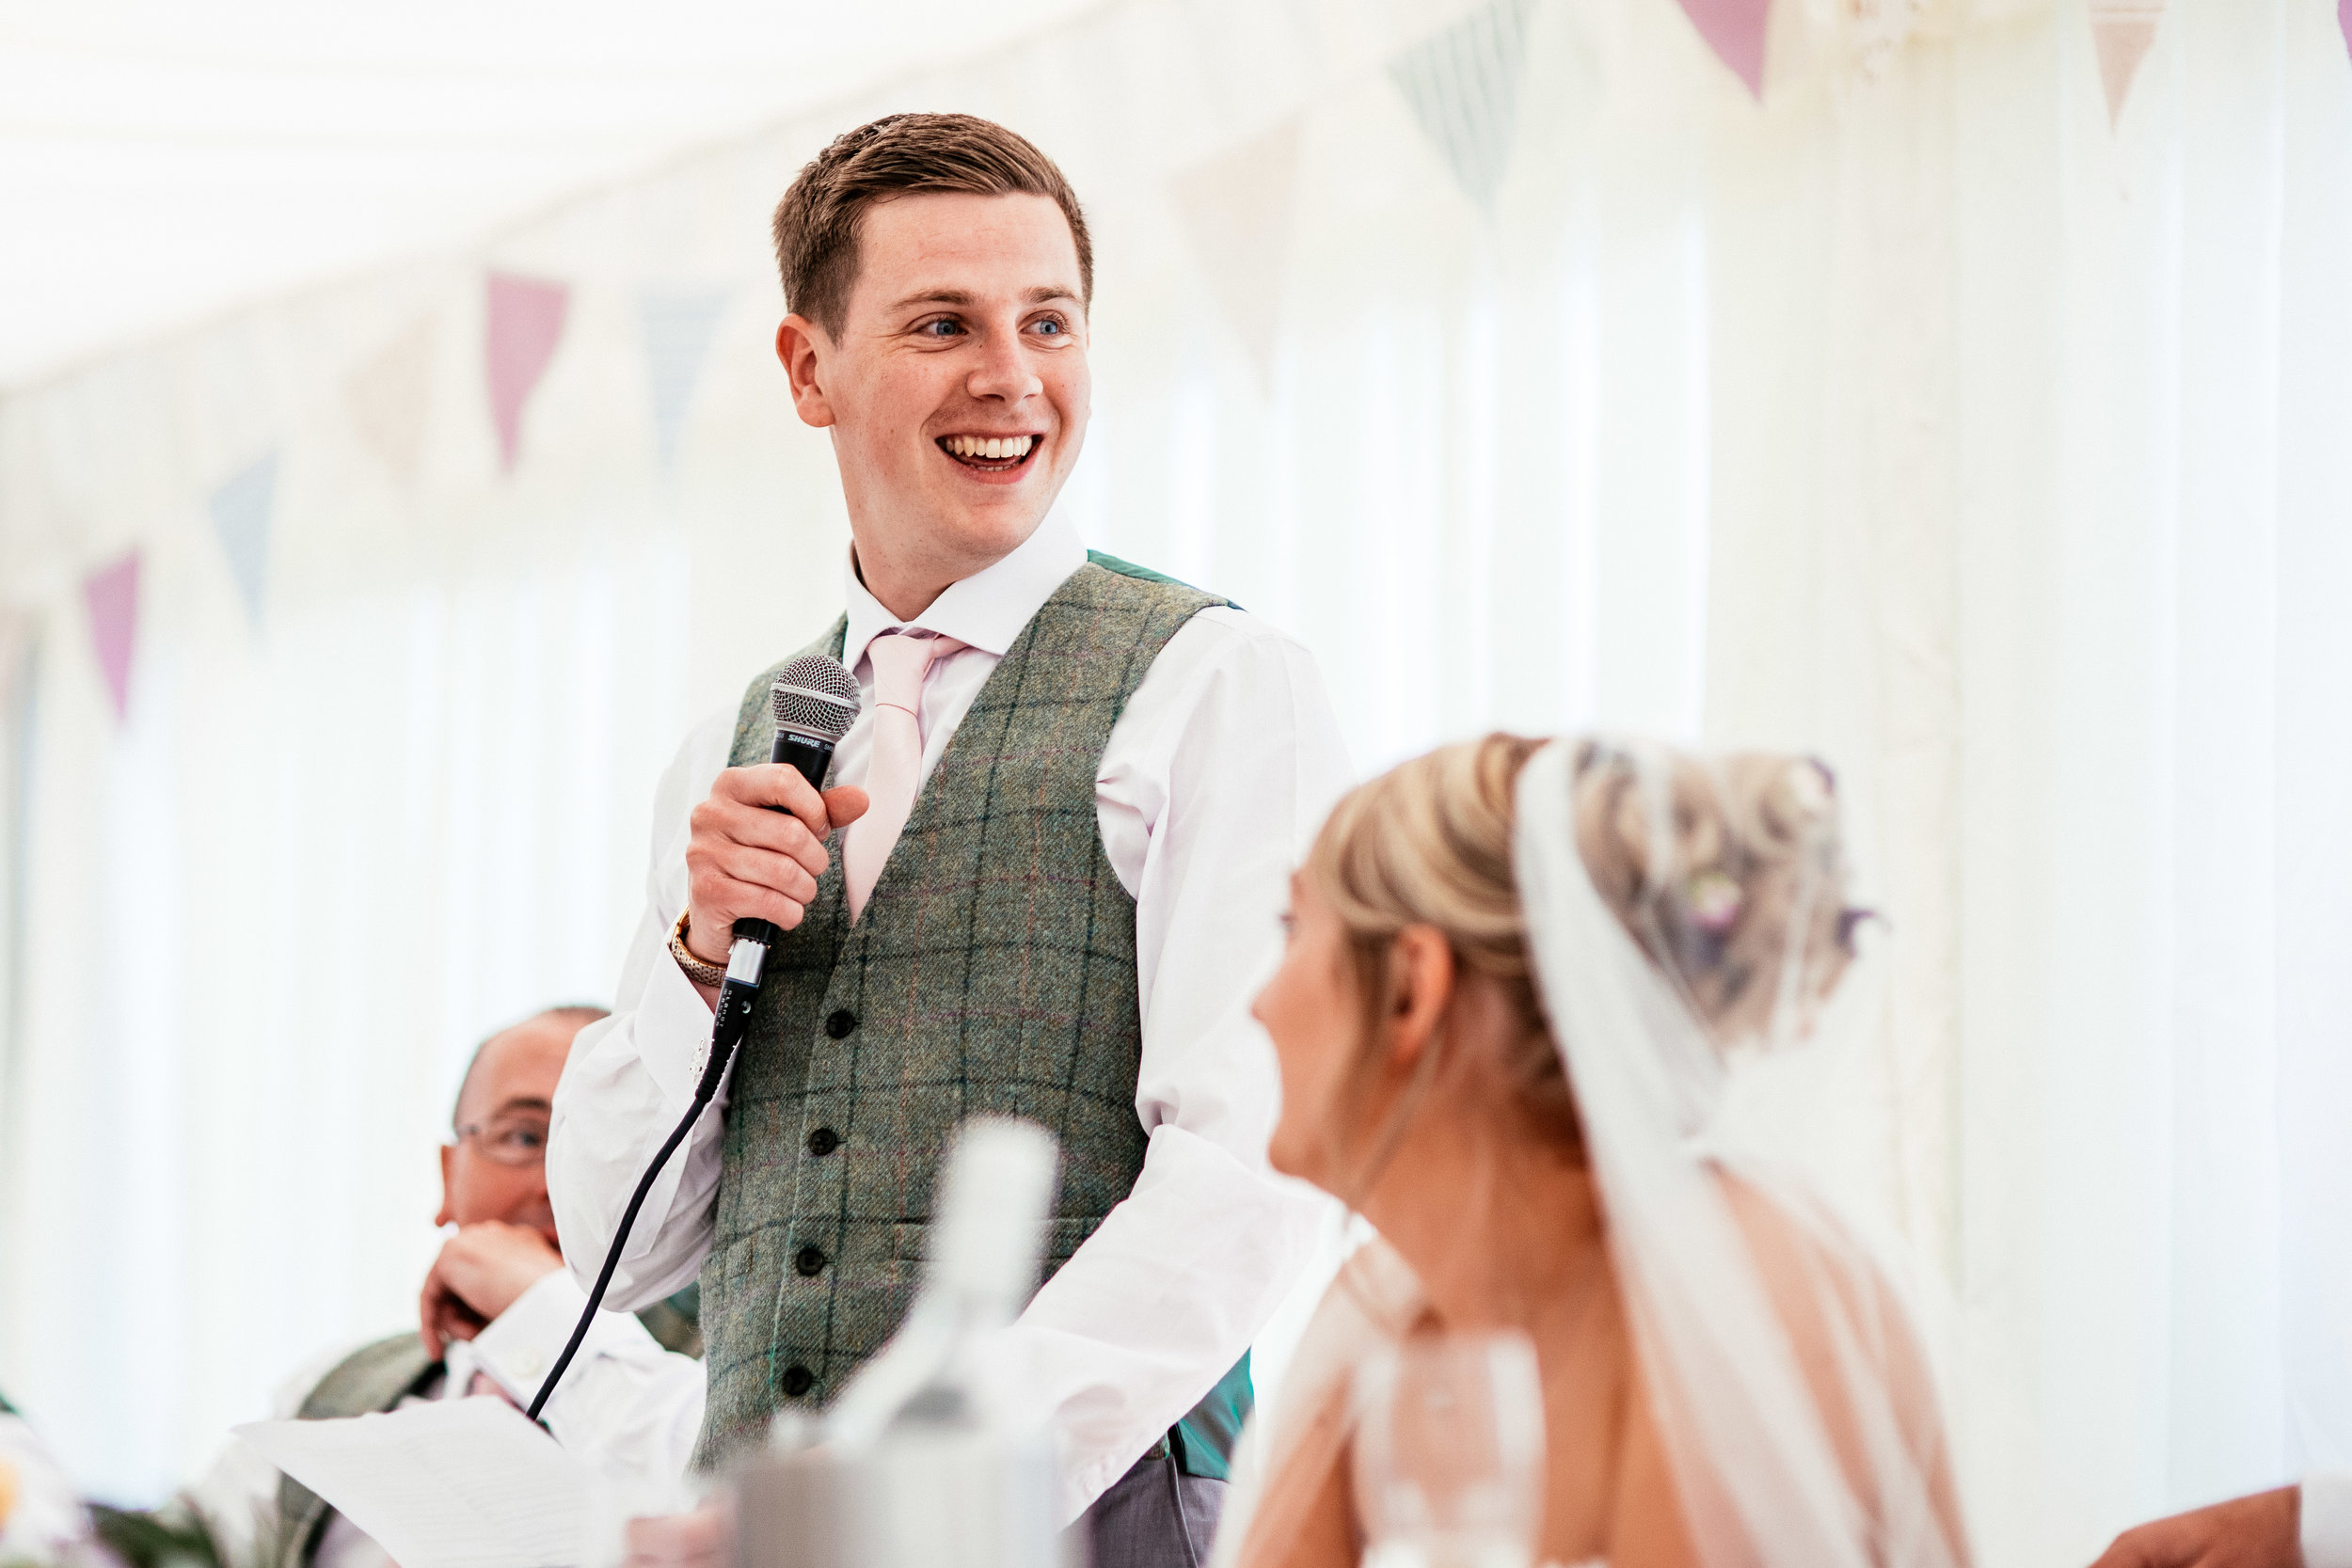 Becky-and-Sam-Wedding-Highlights-62.jpg